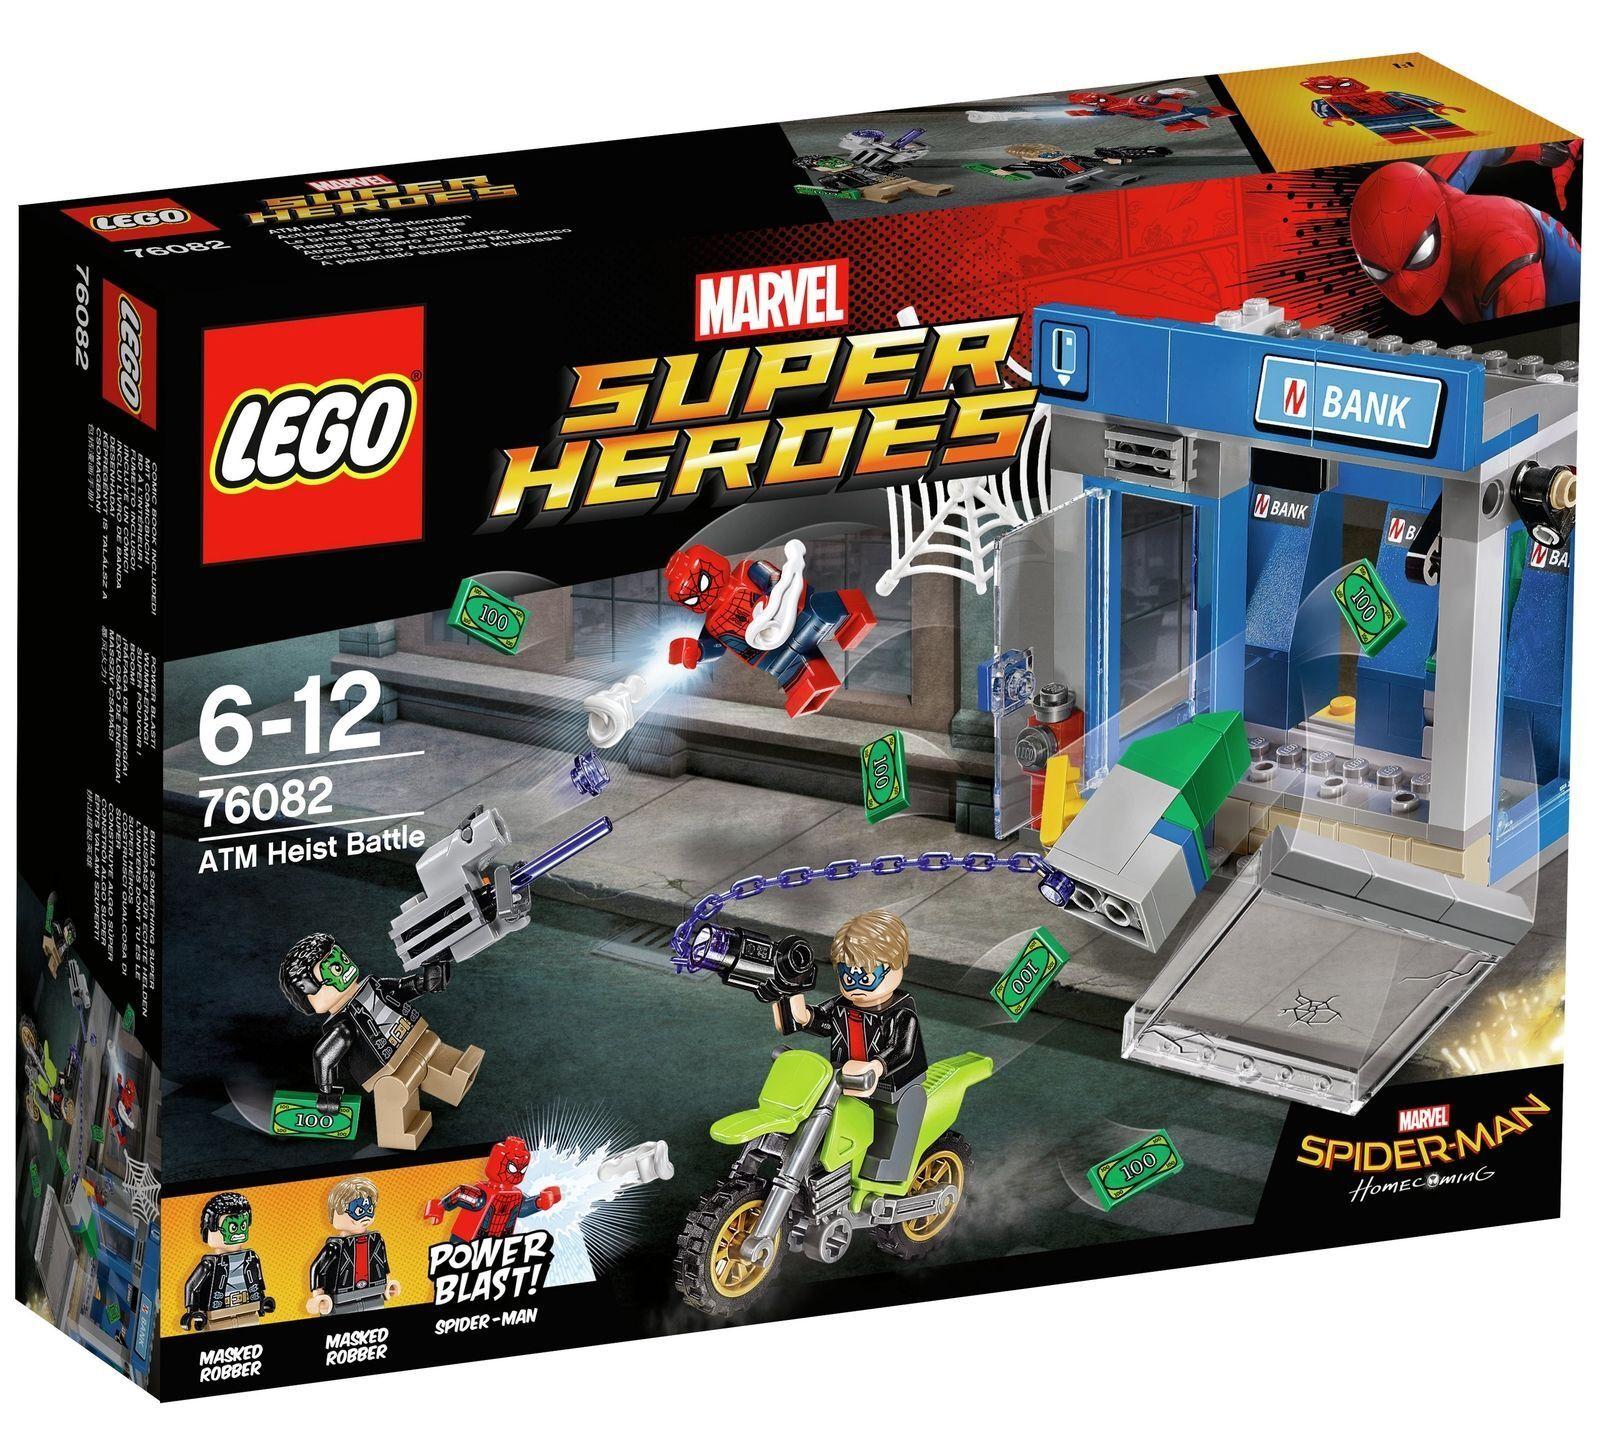 LEGO Marvel Super Heroes Spider-Man ATM Heist Battle - 76082